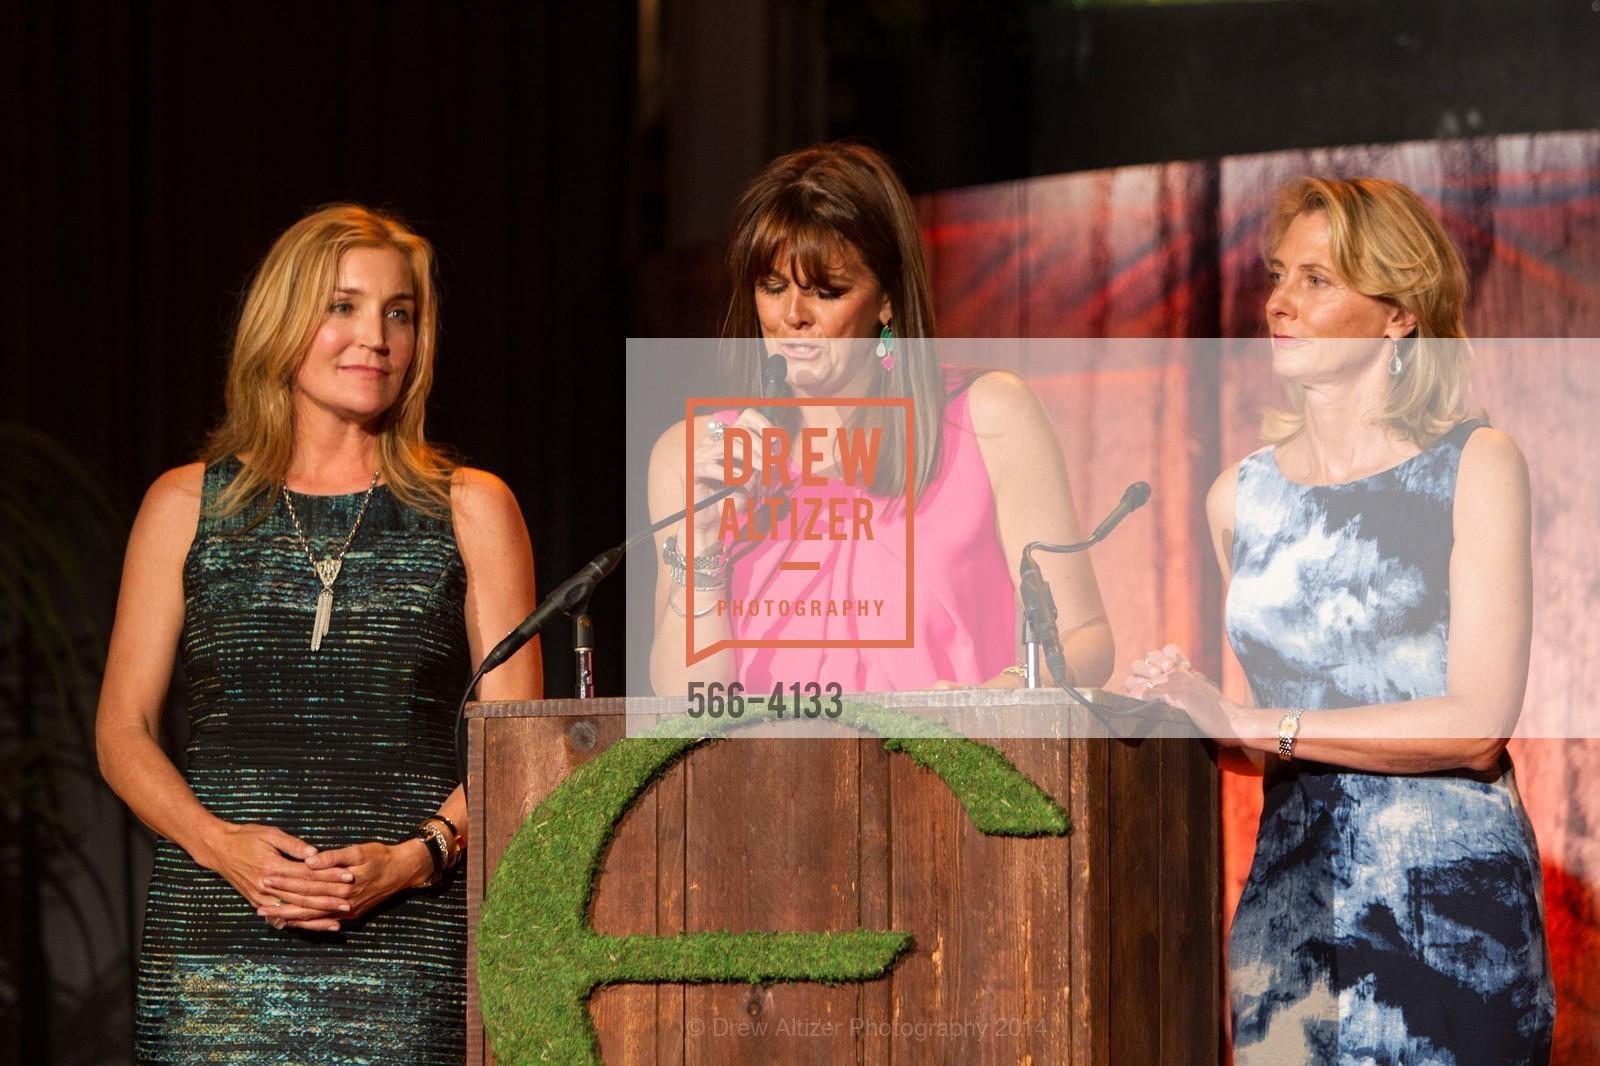 Maggie Mack, Christine Gardner, Jennifer Caldwell, Photo #566-4133